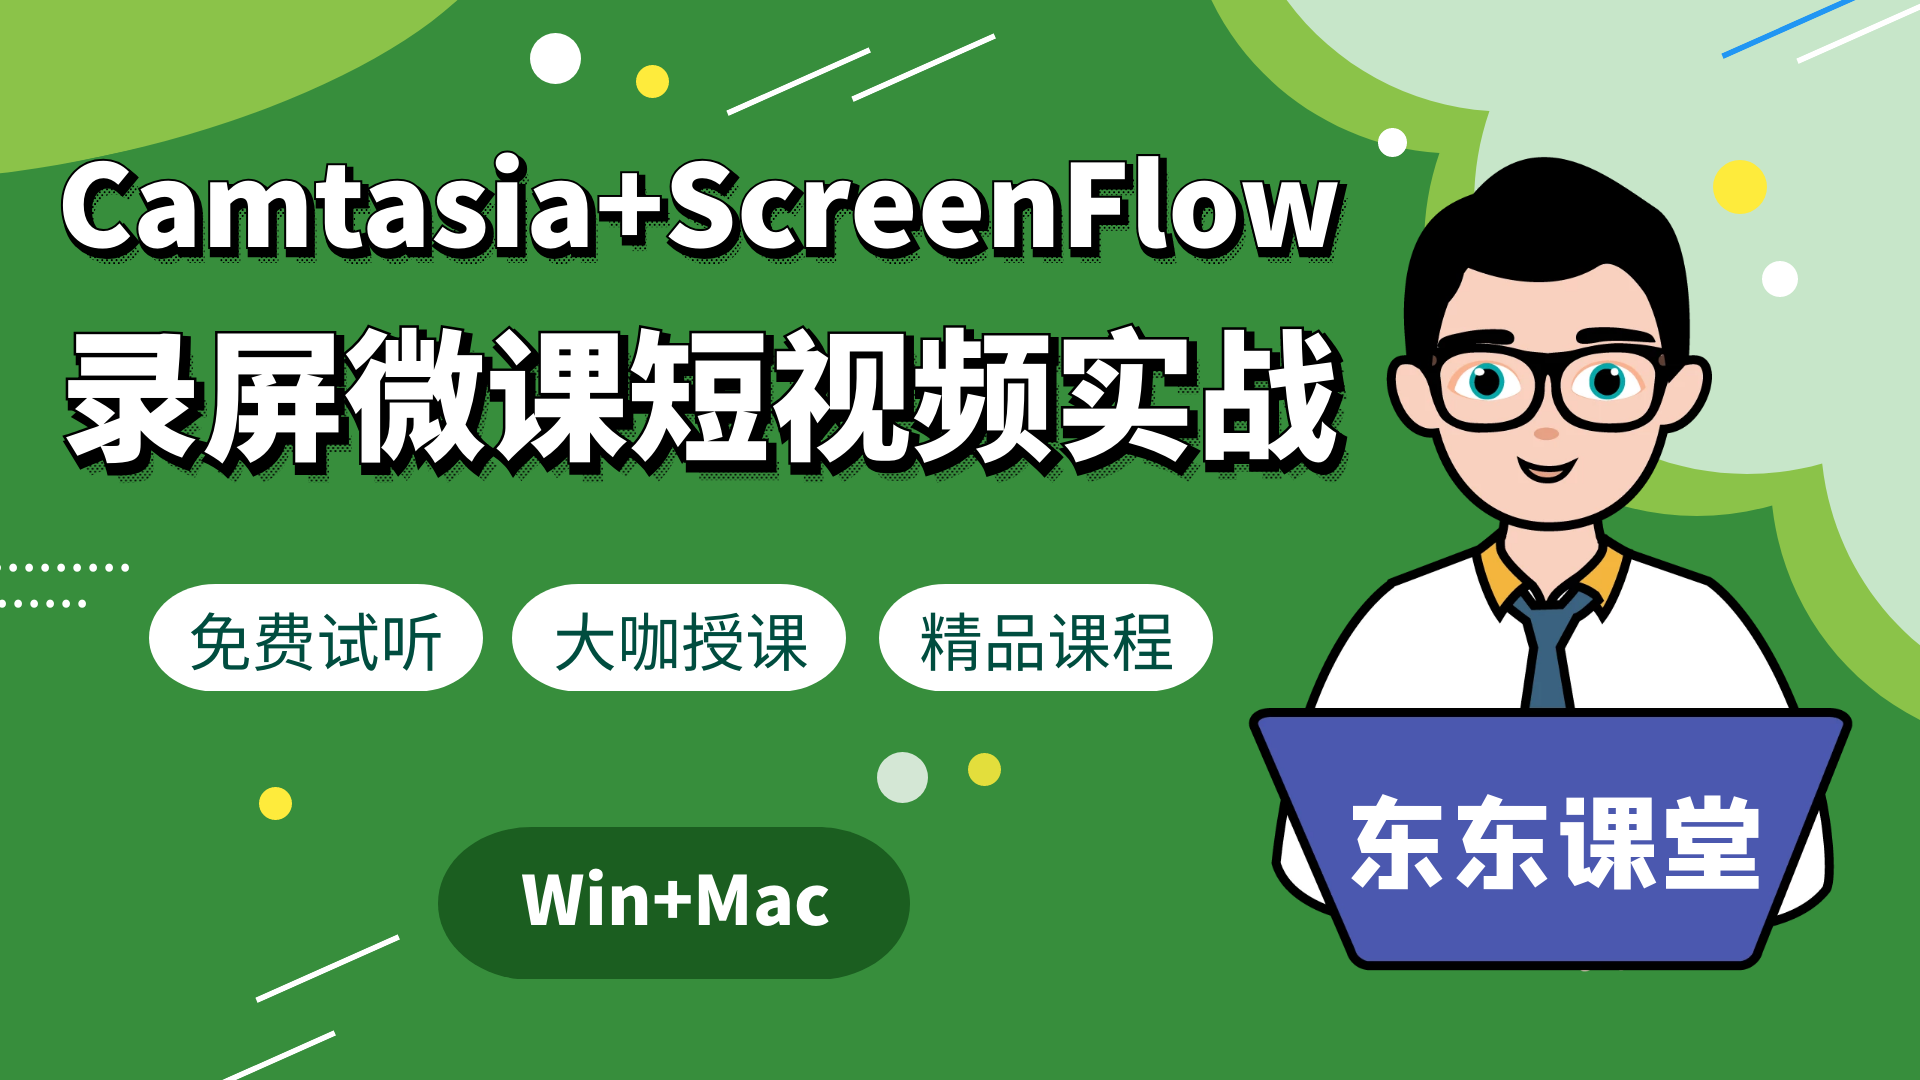 Win+Mac双平台录屏微课短视频剪辑